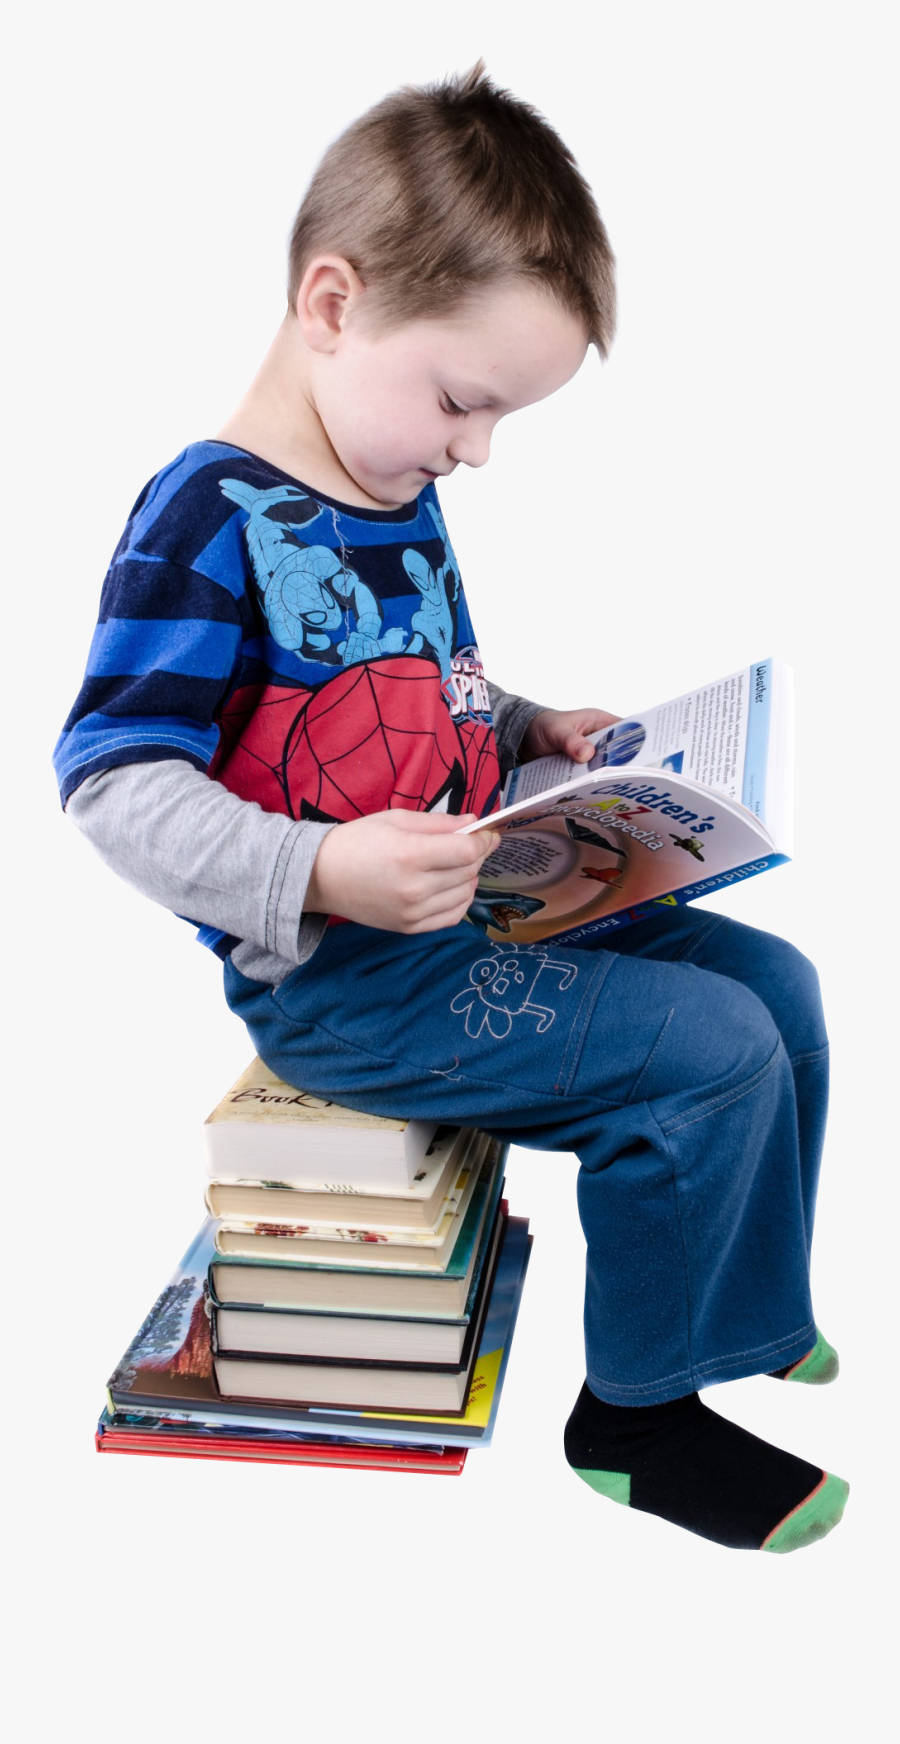 Boy Reading Books Png Image - Children Sitting Reading, Transparent Clipart